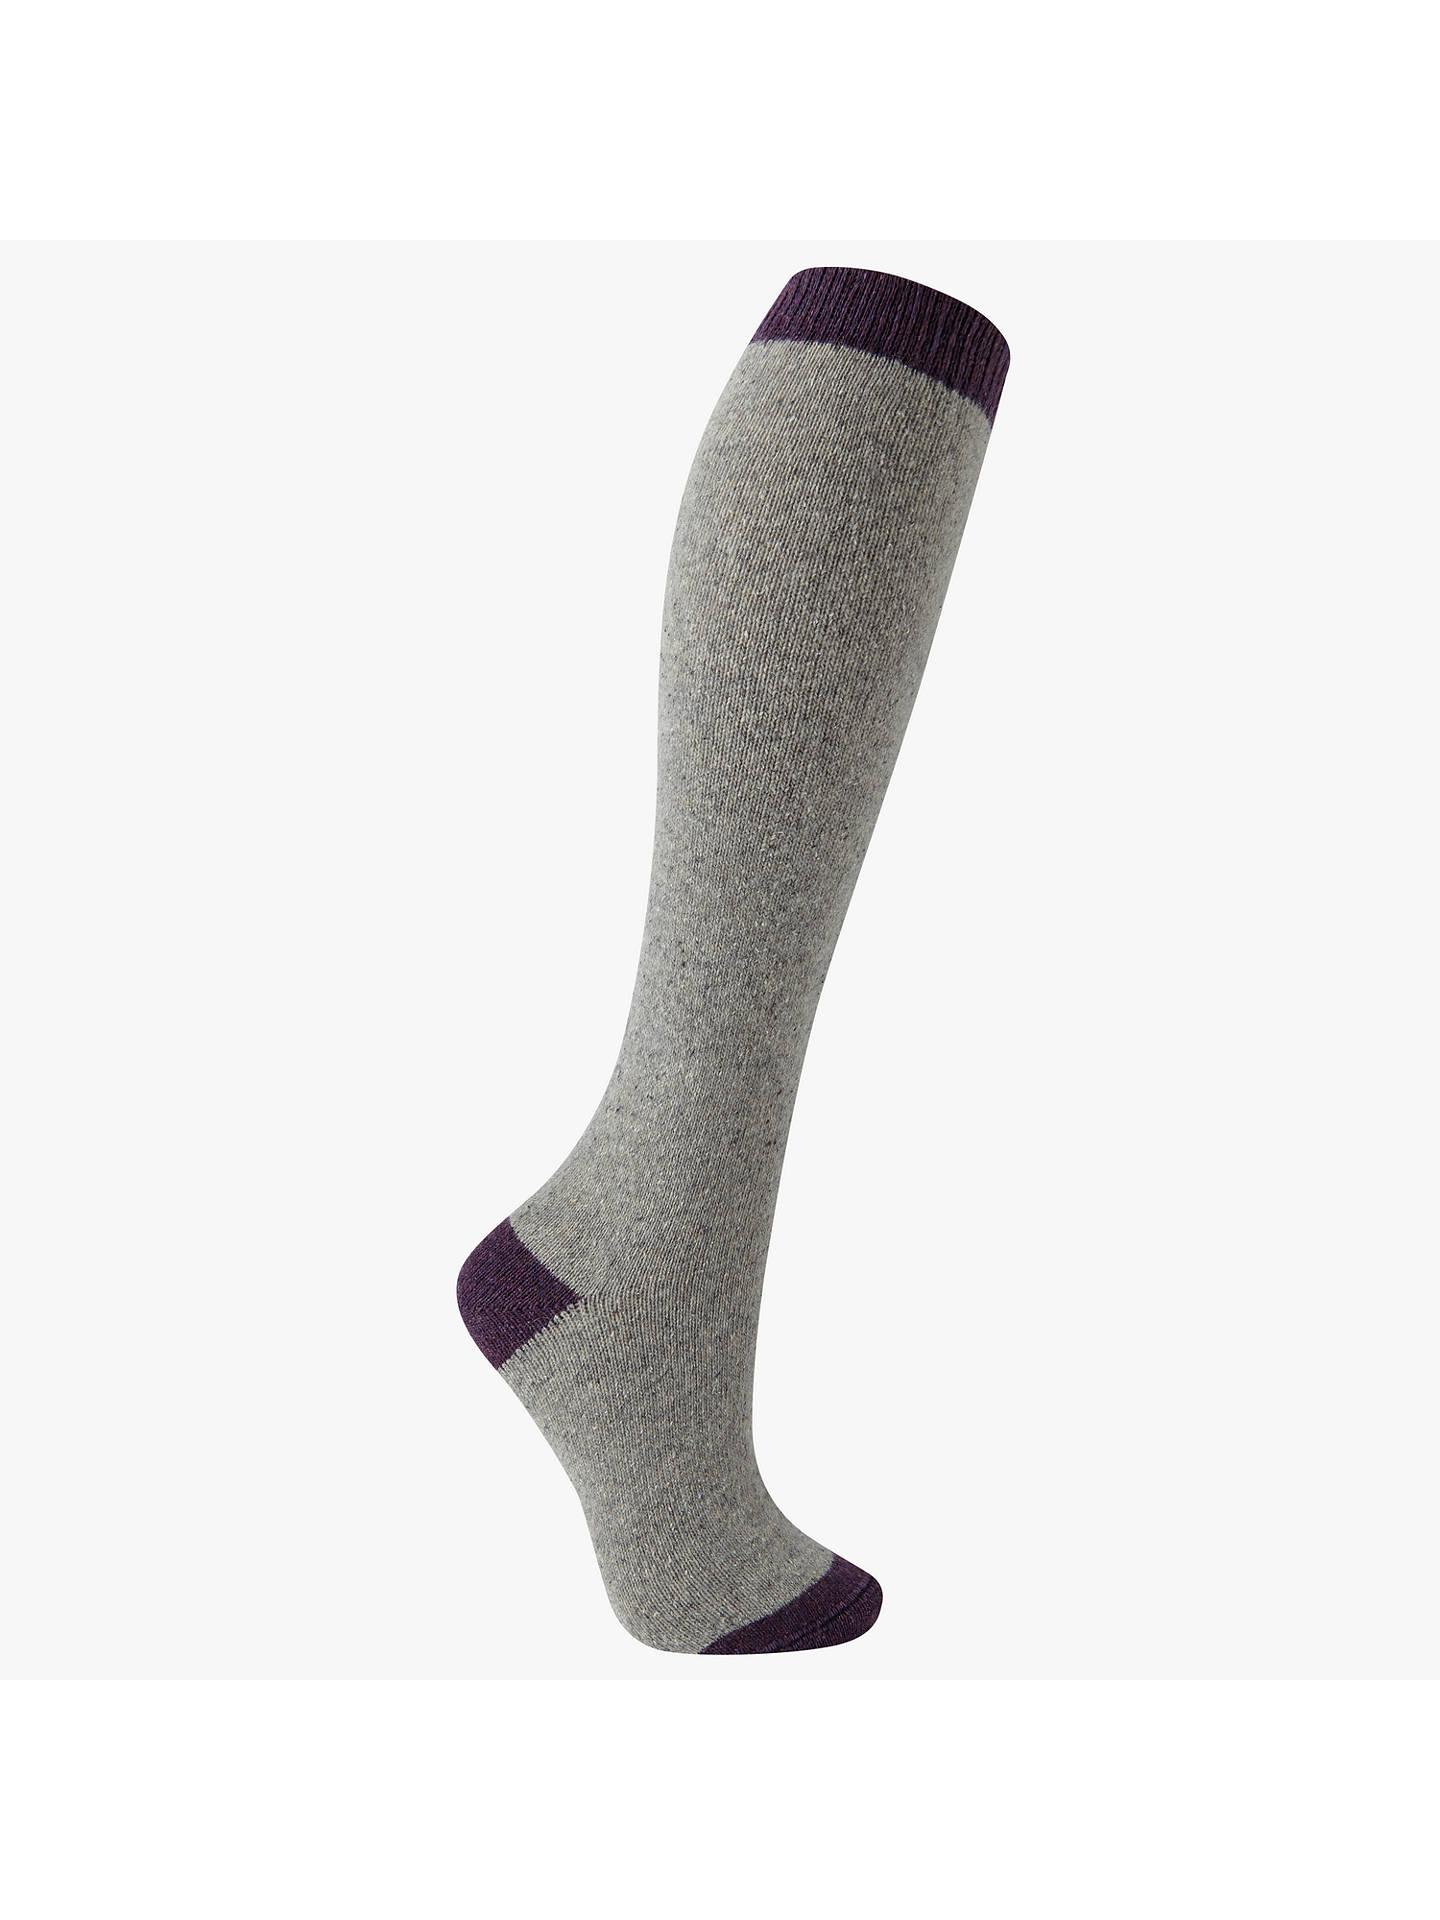 624c0a08cb4 Buy John Lewis Wool and Silk Blend Knee High Socks